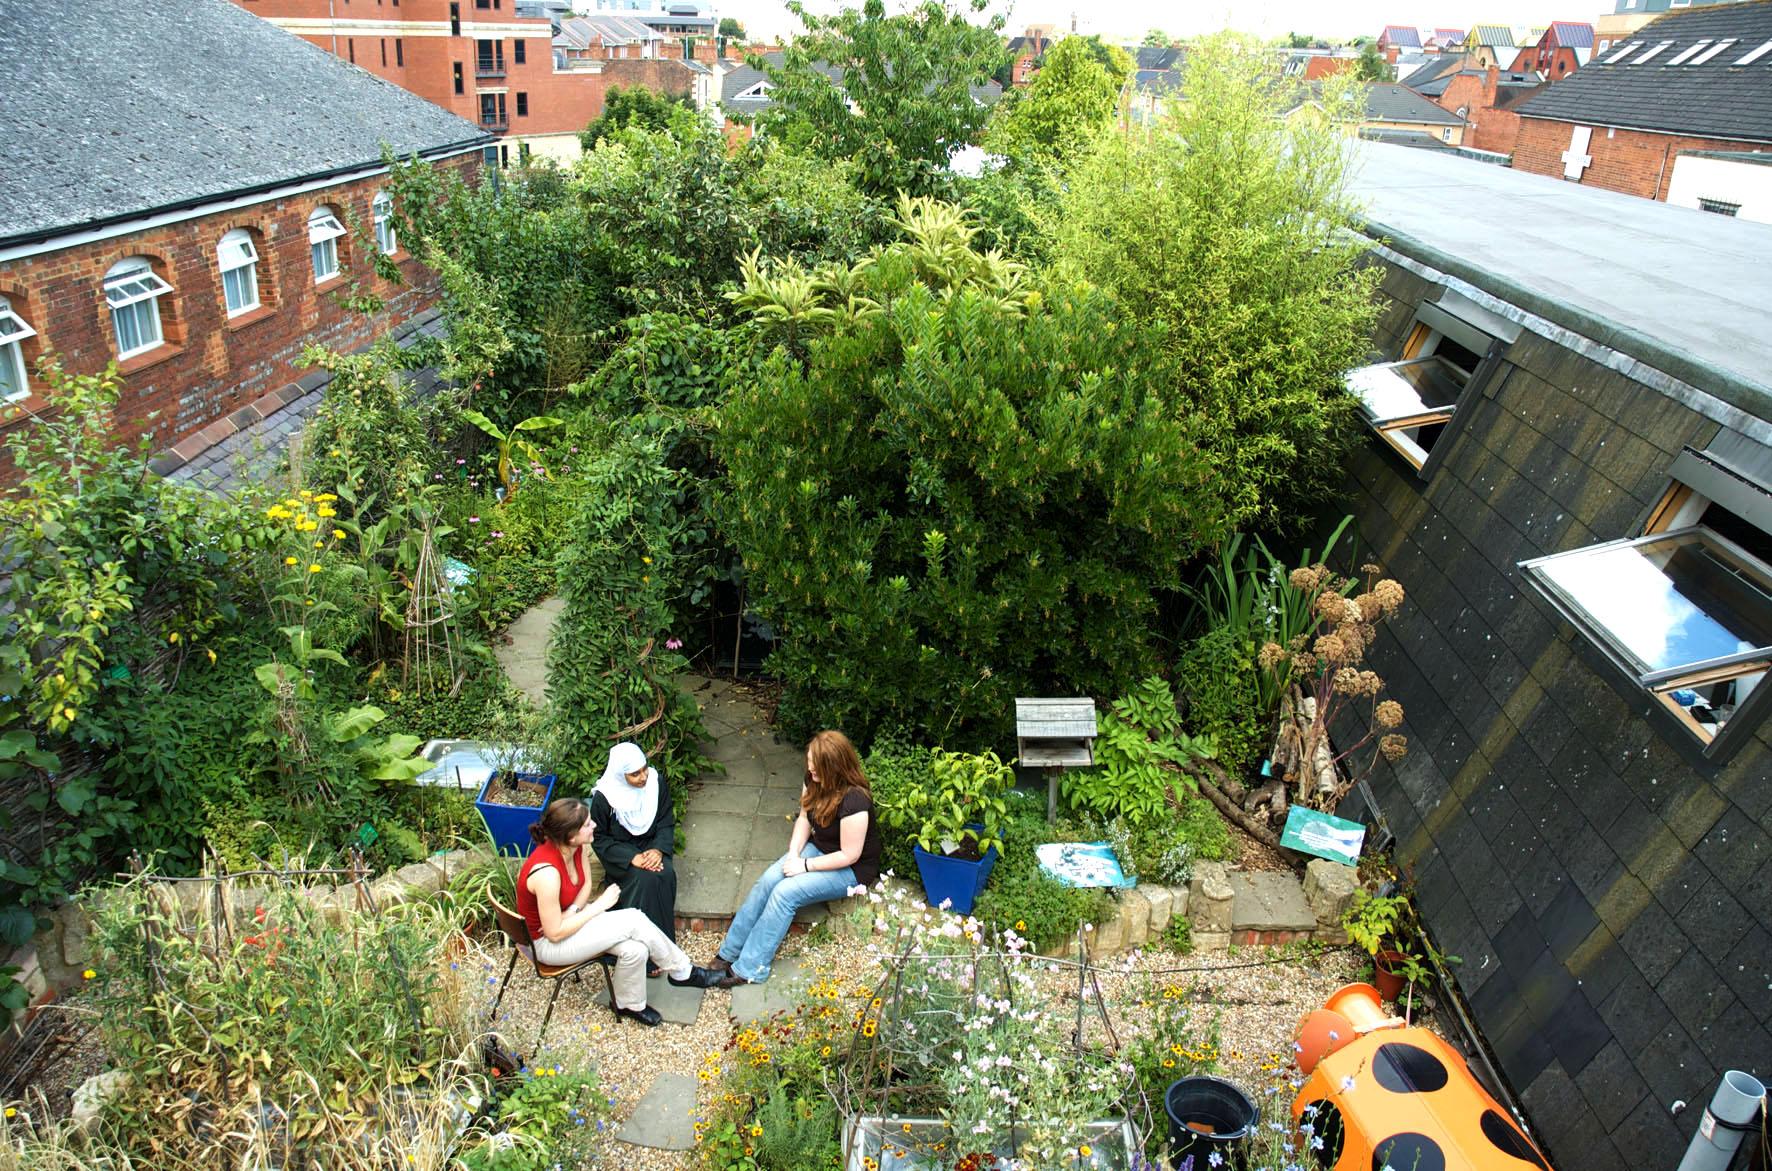 RISC Roof Garden | GardenVisit.com, the garden landscape guide